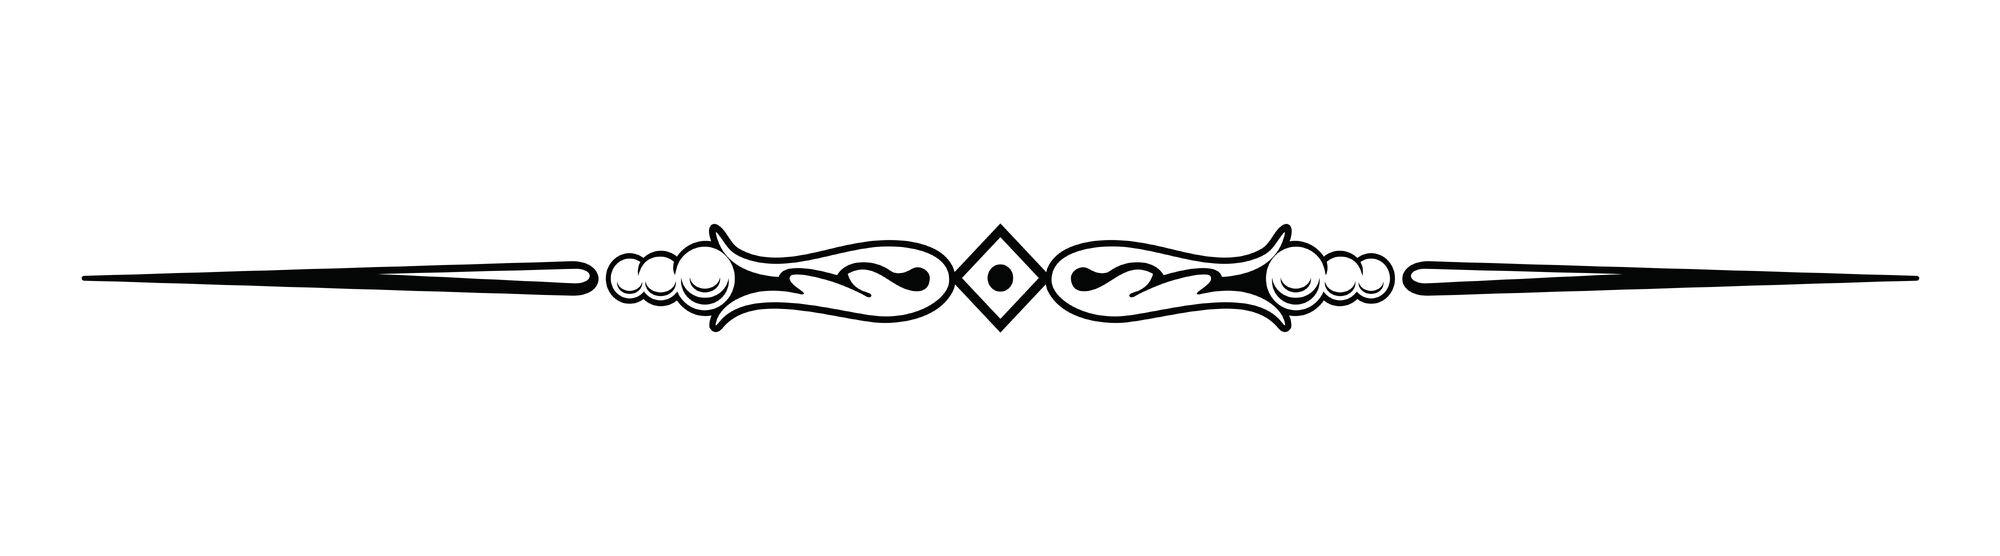 Line Art Media Design : Image decorative line dividers clip art ql lf clipart